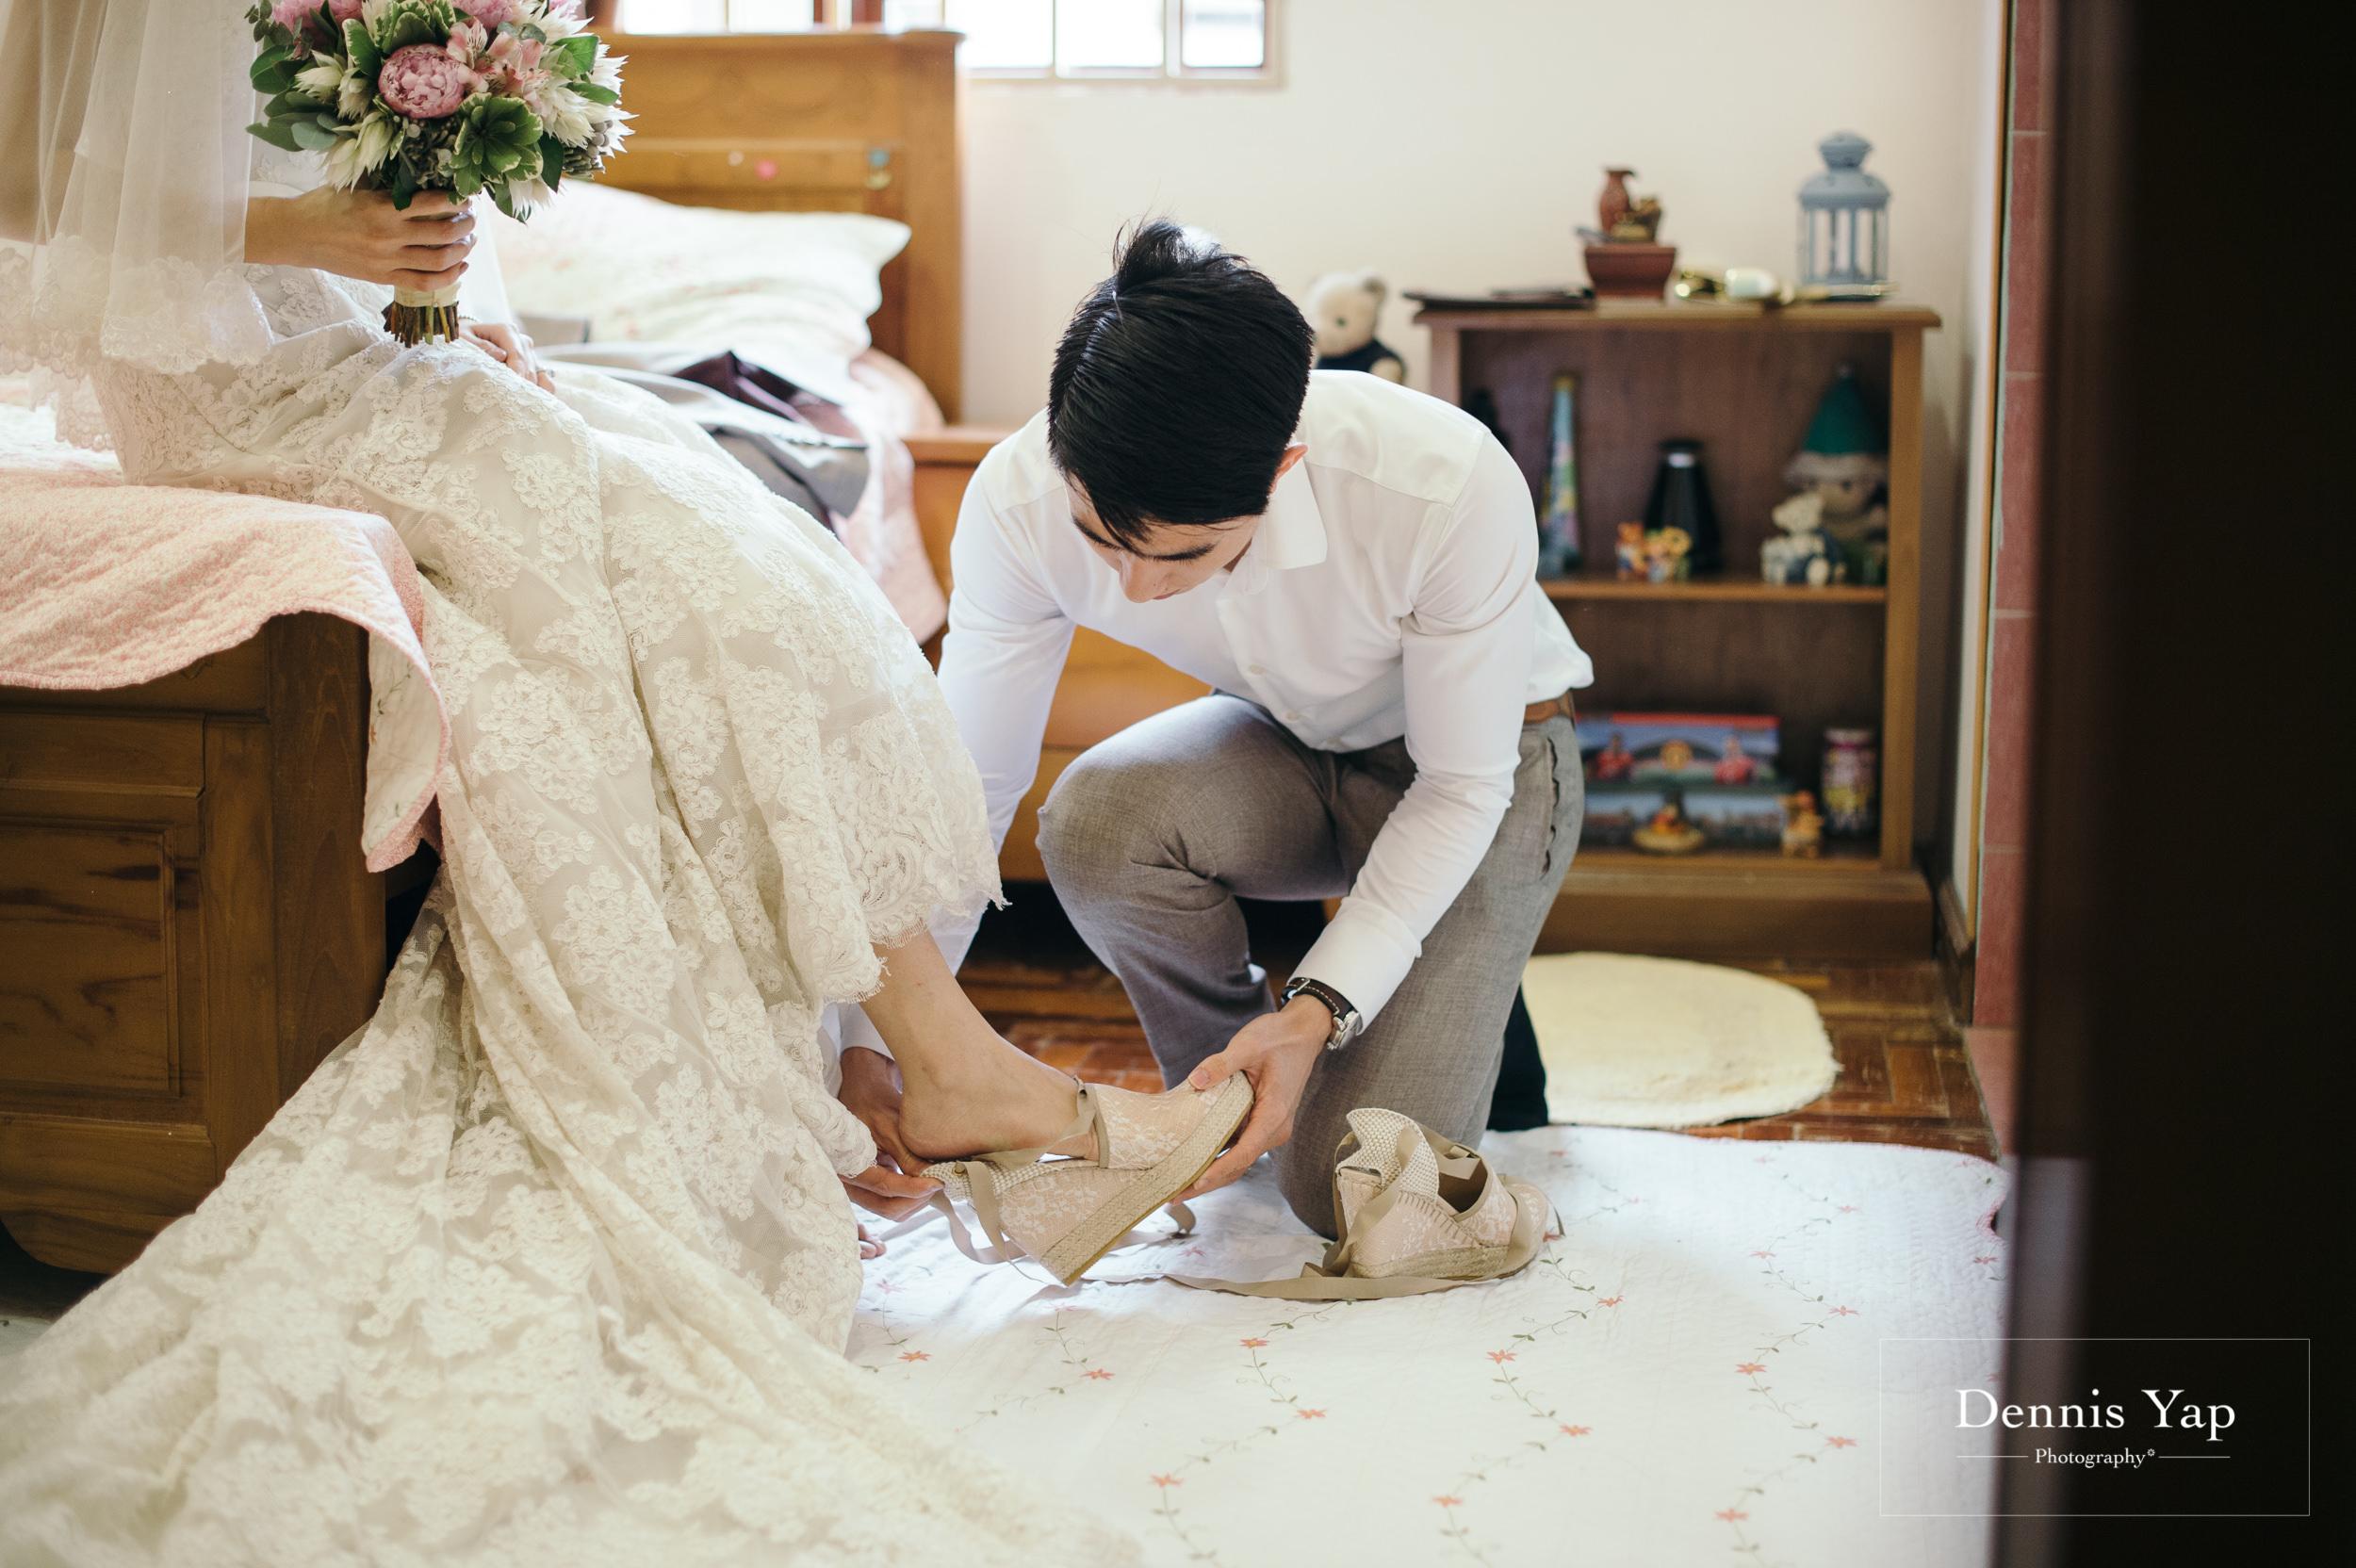 danny sherine wedding day group photo dennis yap photography usj heights malaysia top wedding photographer-11.jpg